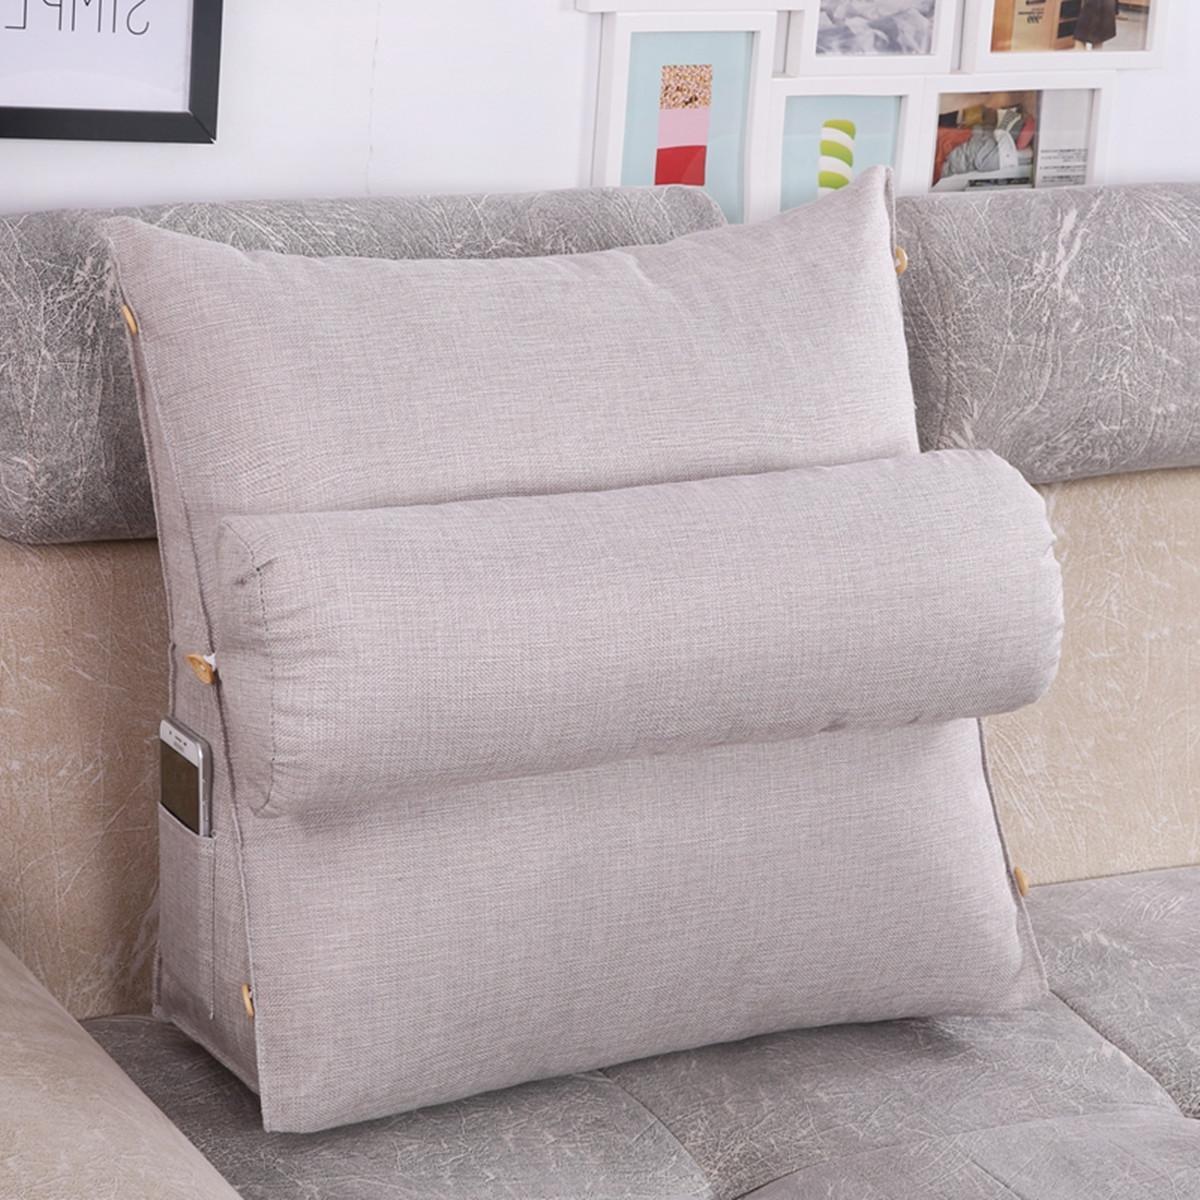 adjustable office sofa back back pillow bed backrest chair rest neck support light gray